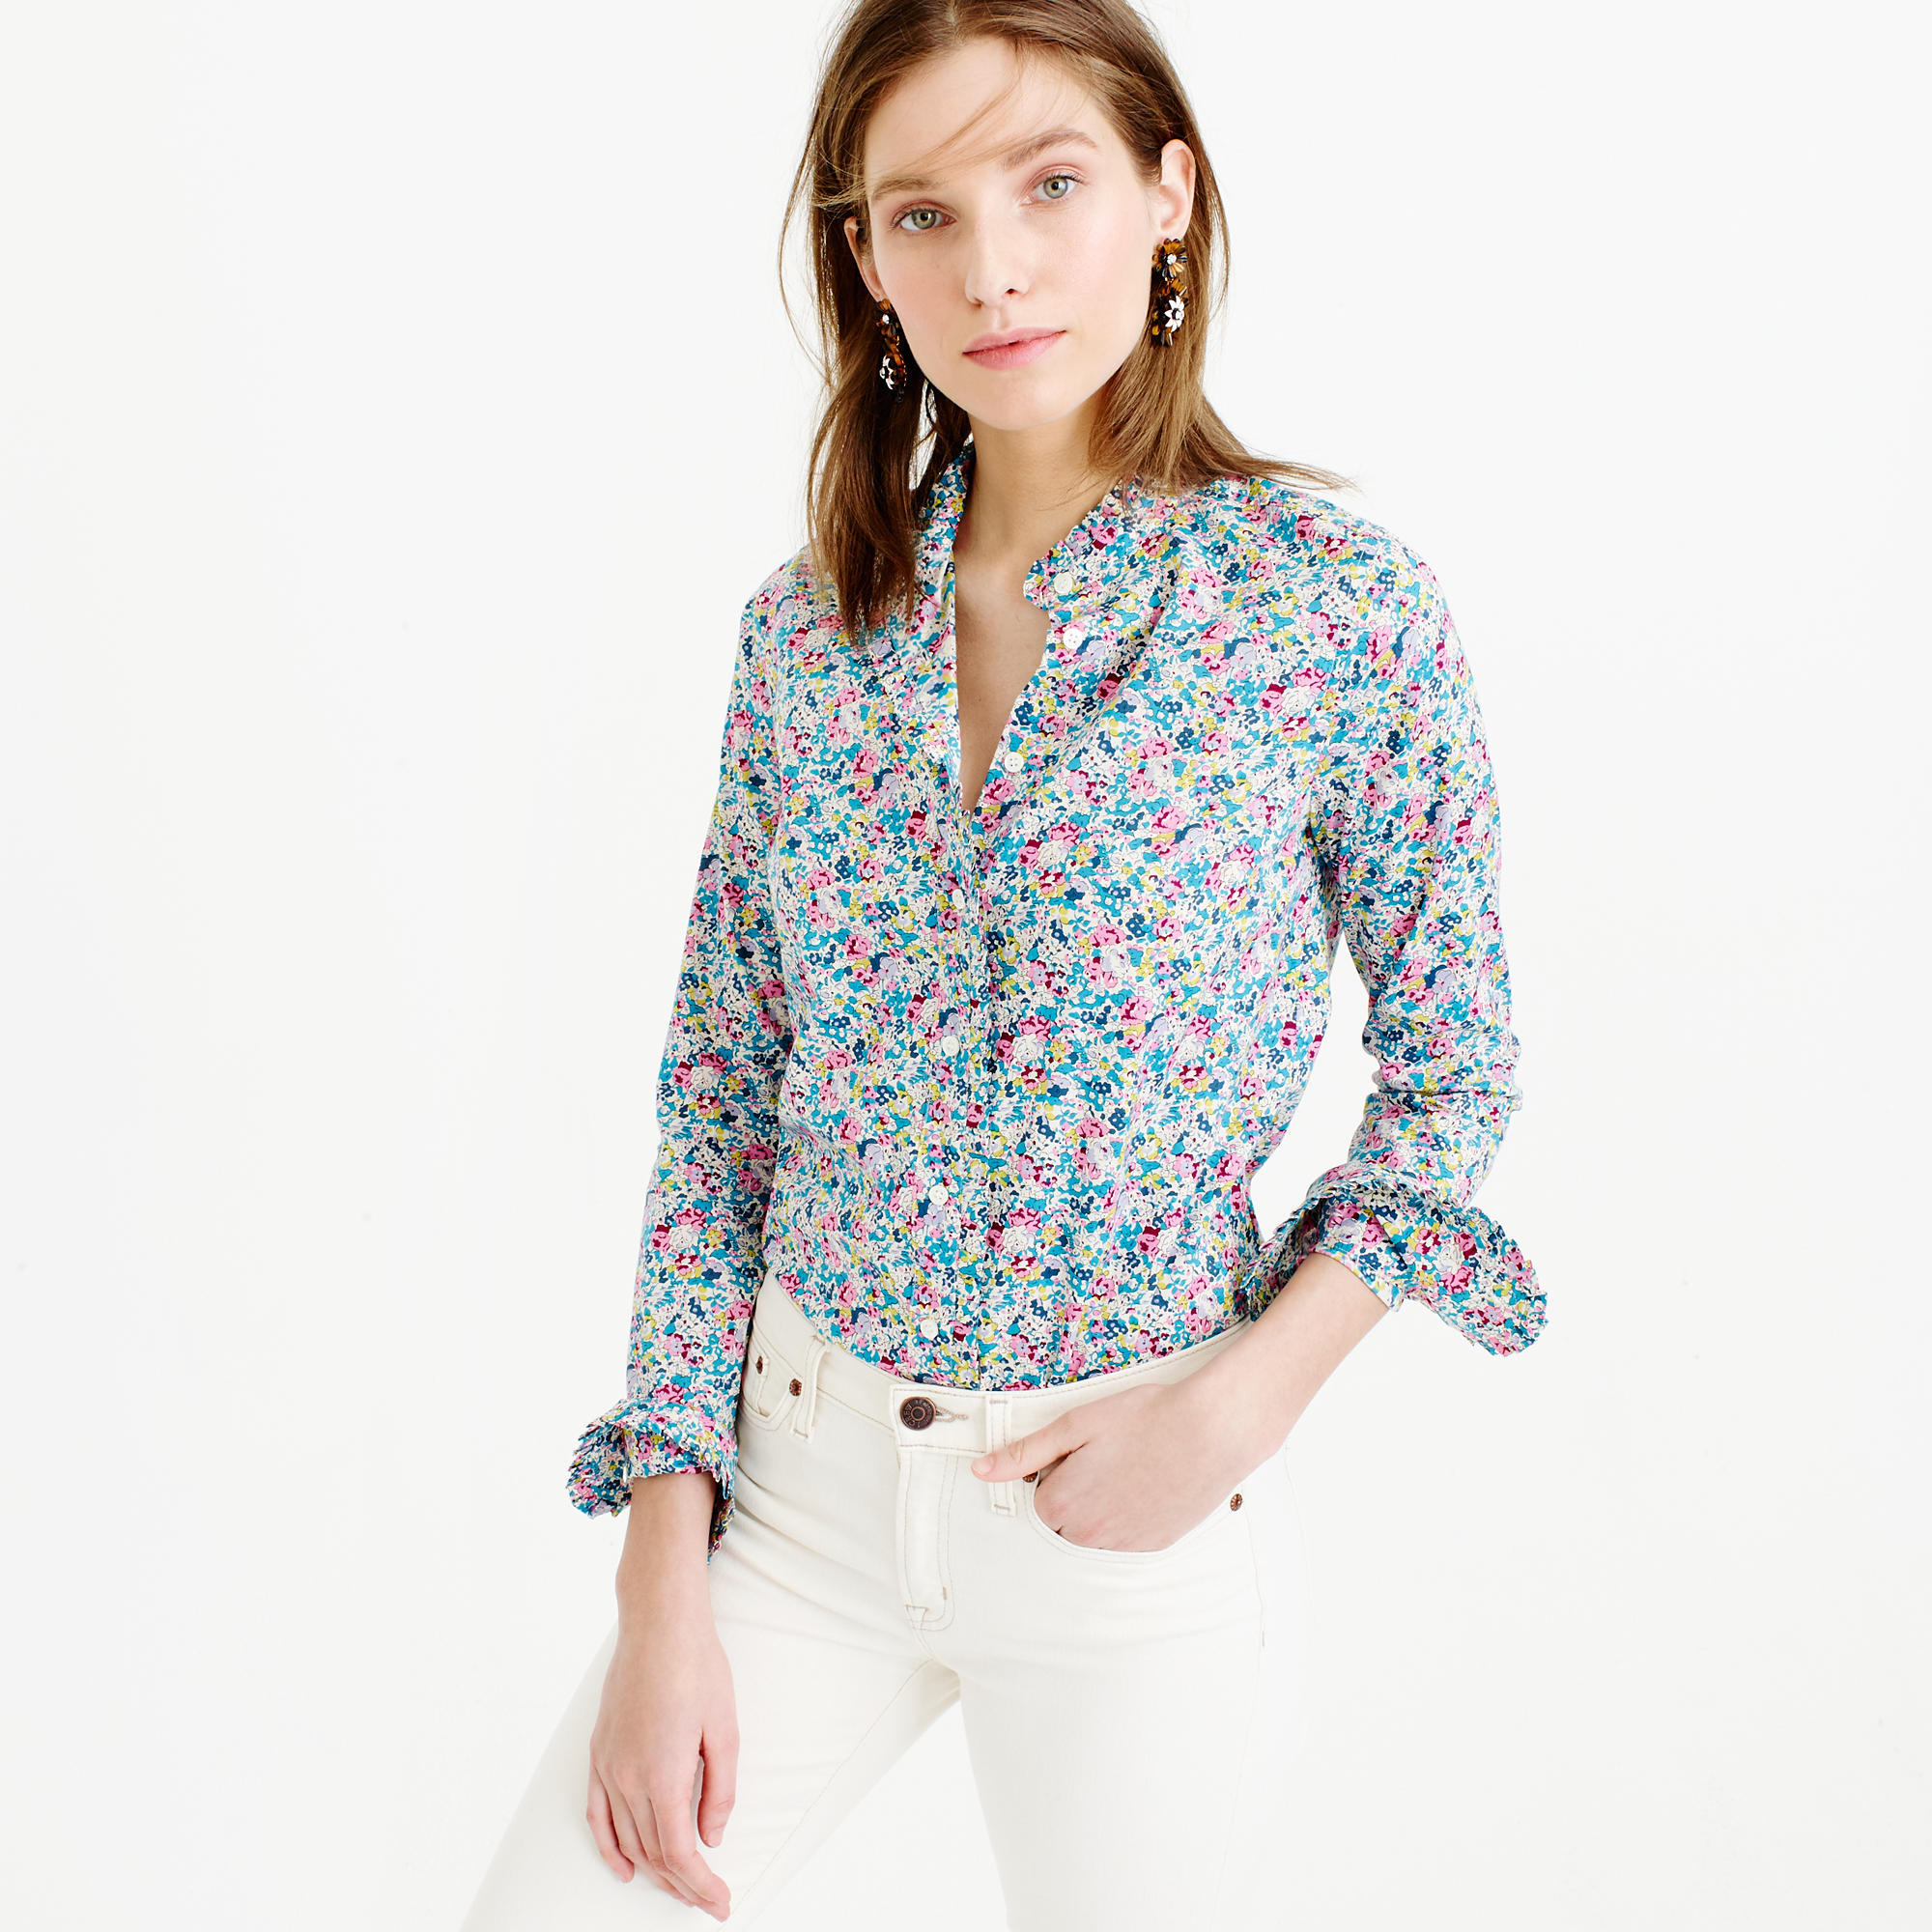 Floral Button Up Shirt Womens Is Shirt